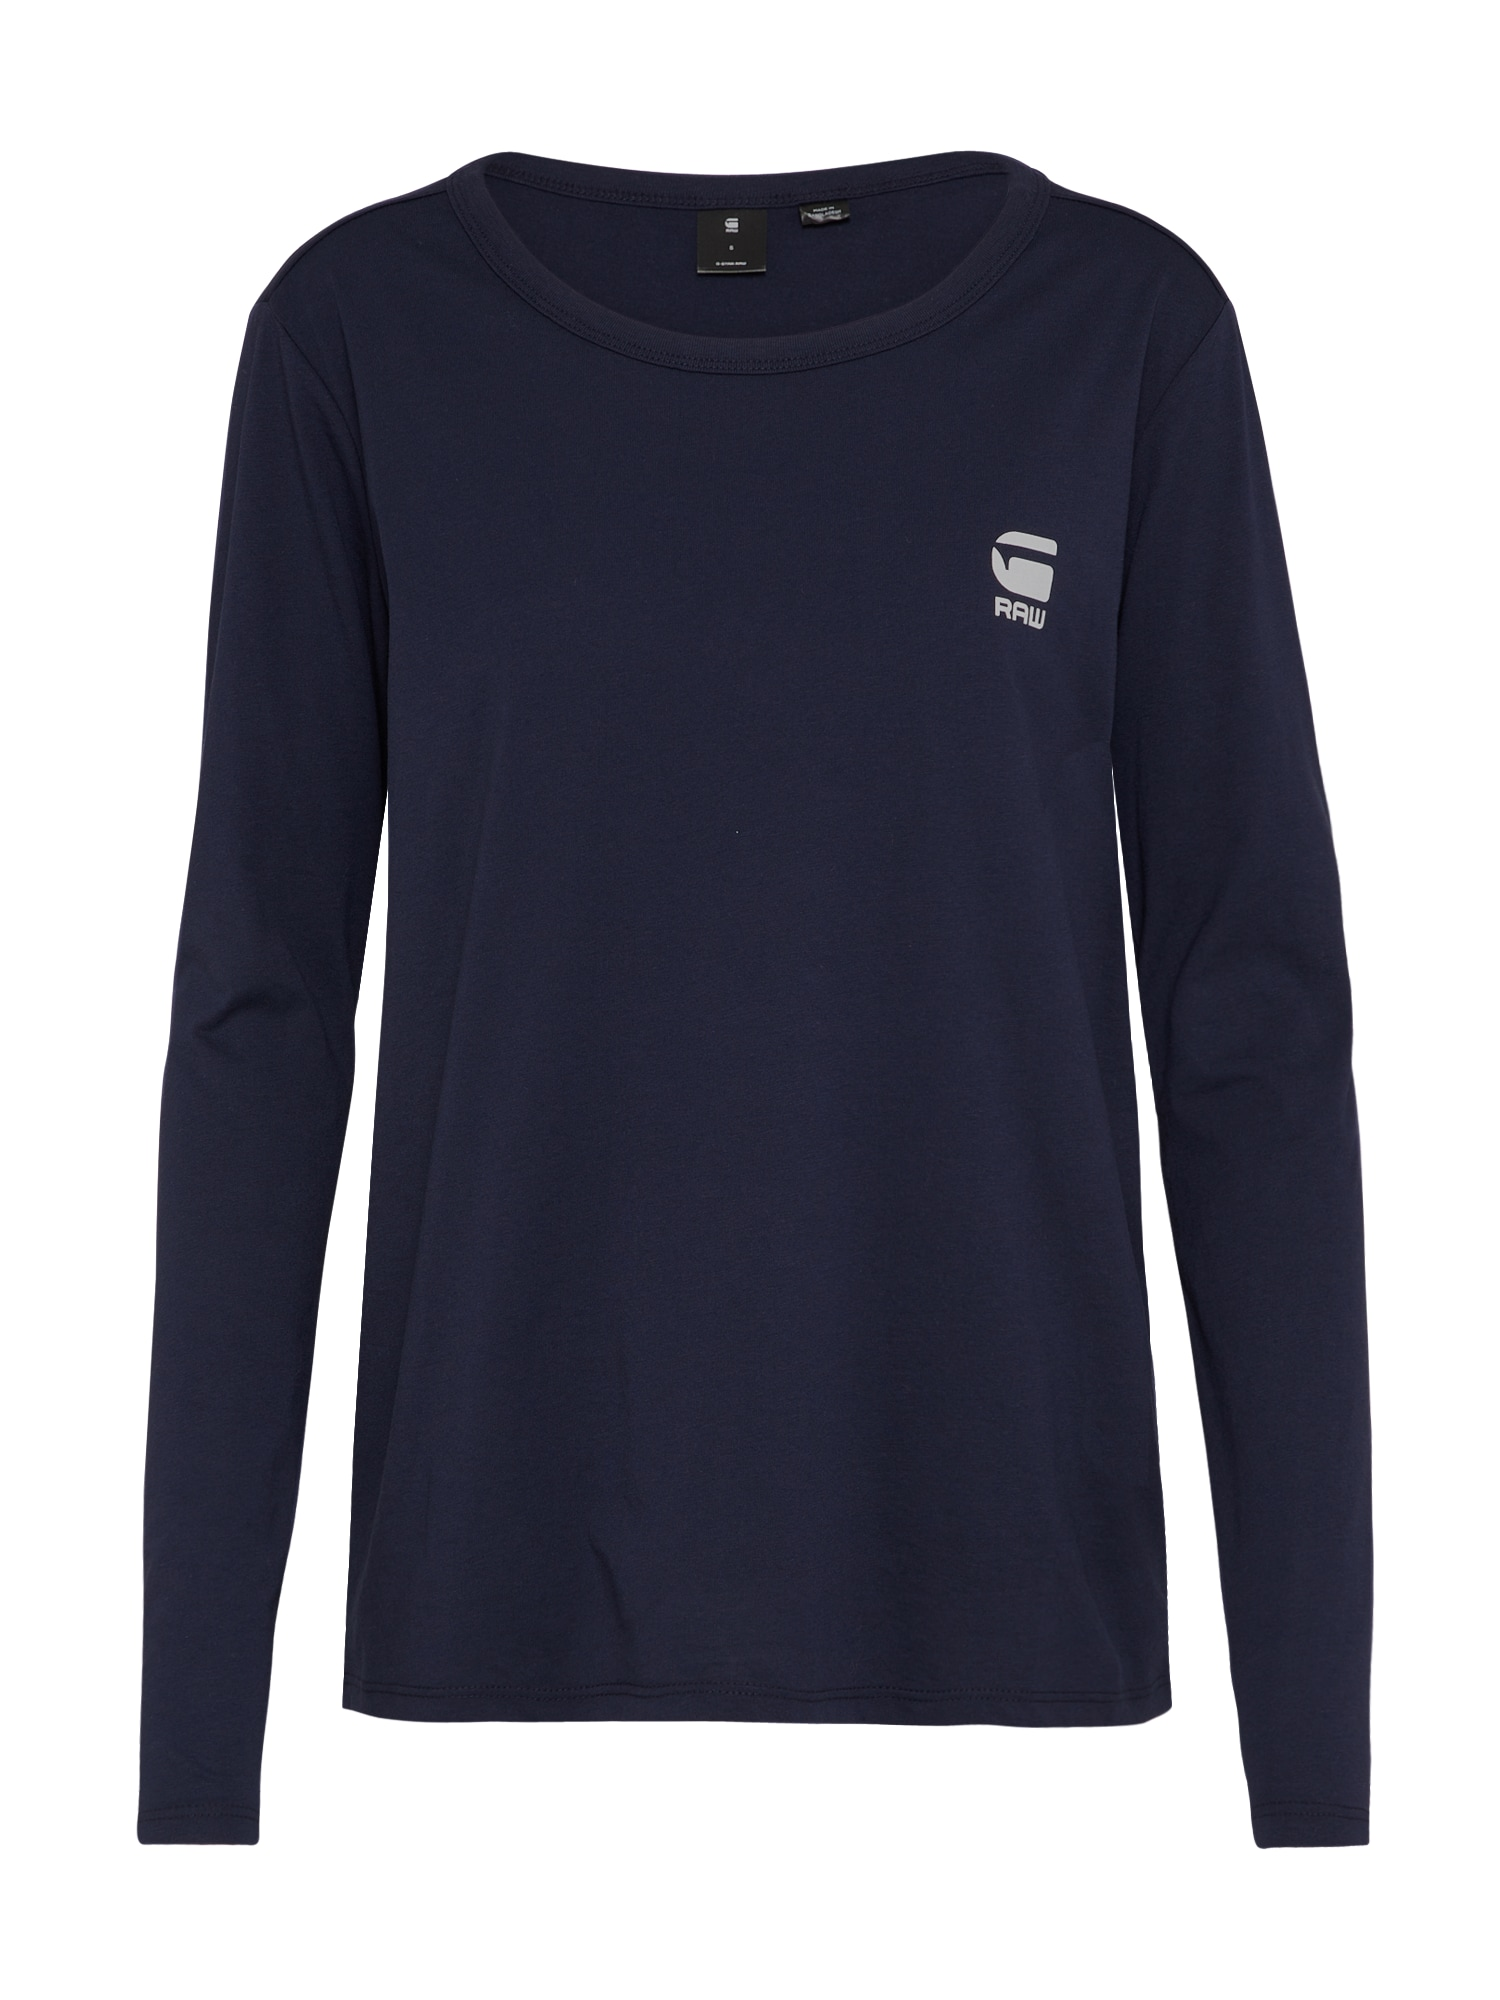 G-STAR RAW Dames Shirt blauw